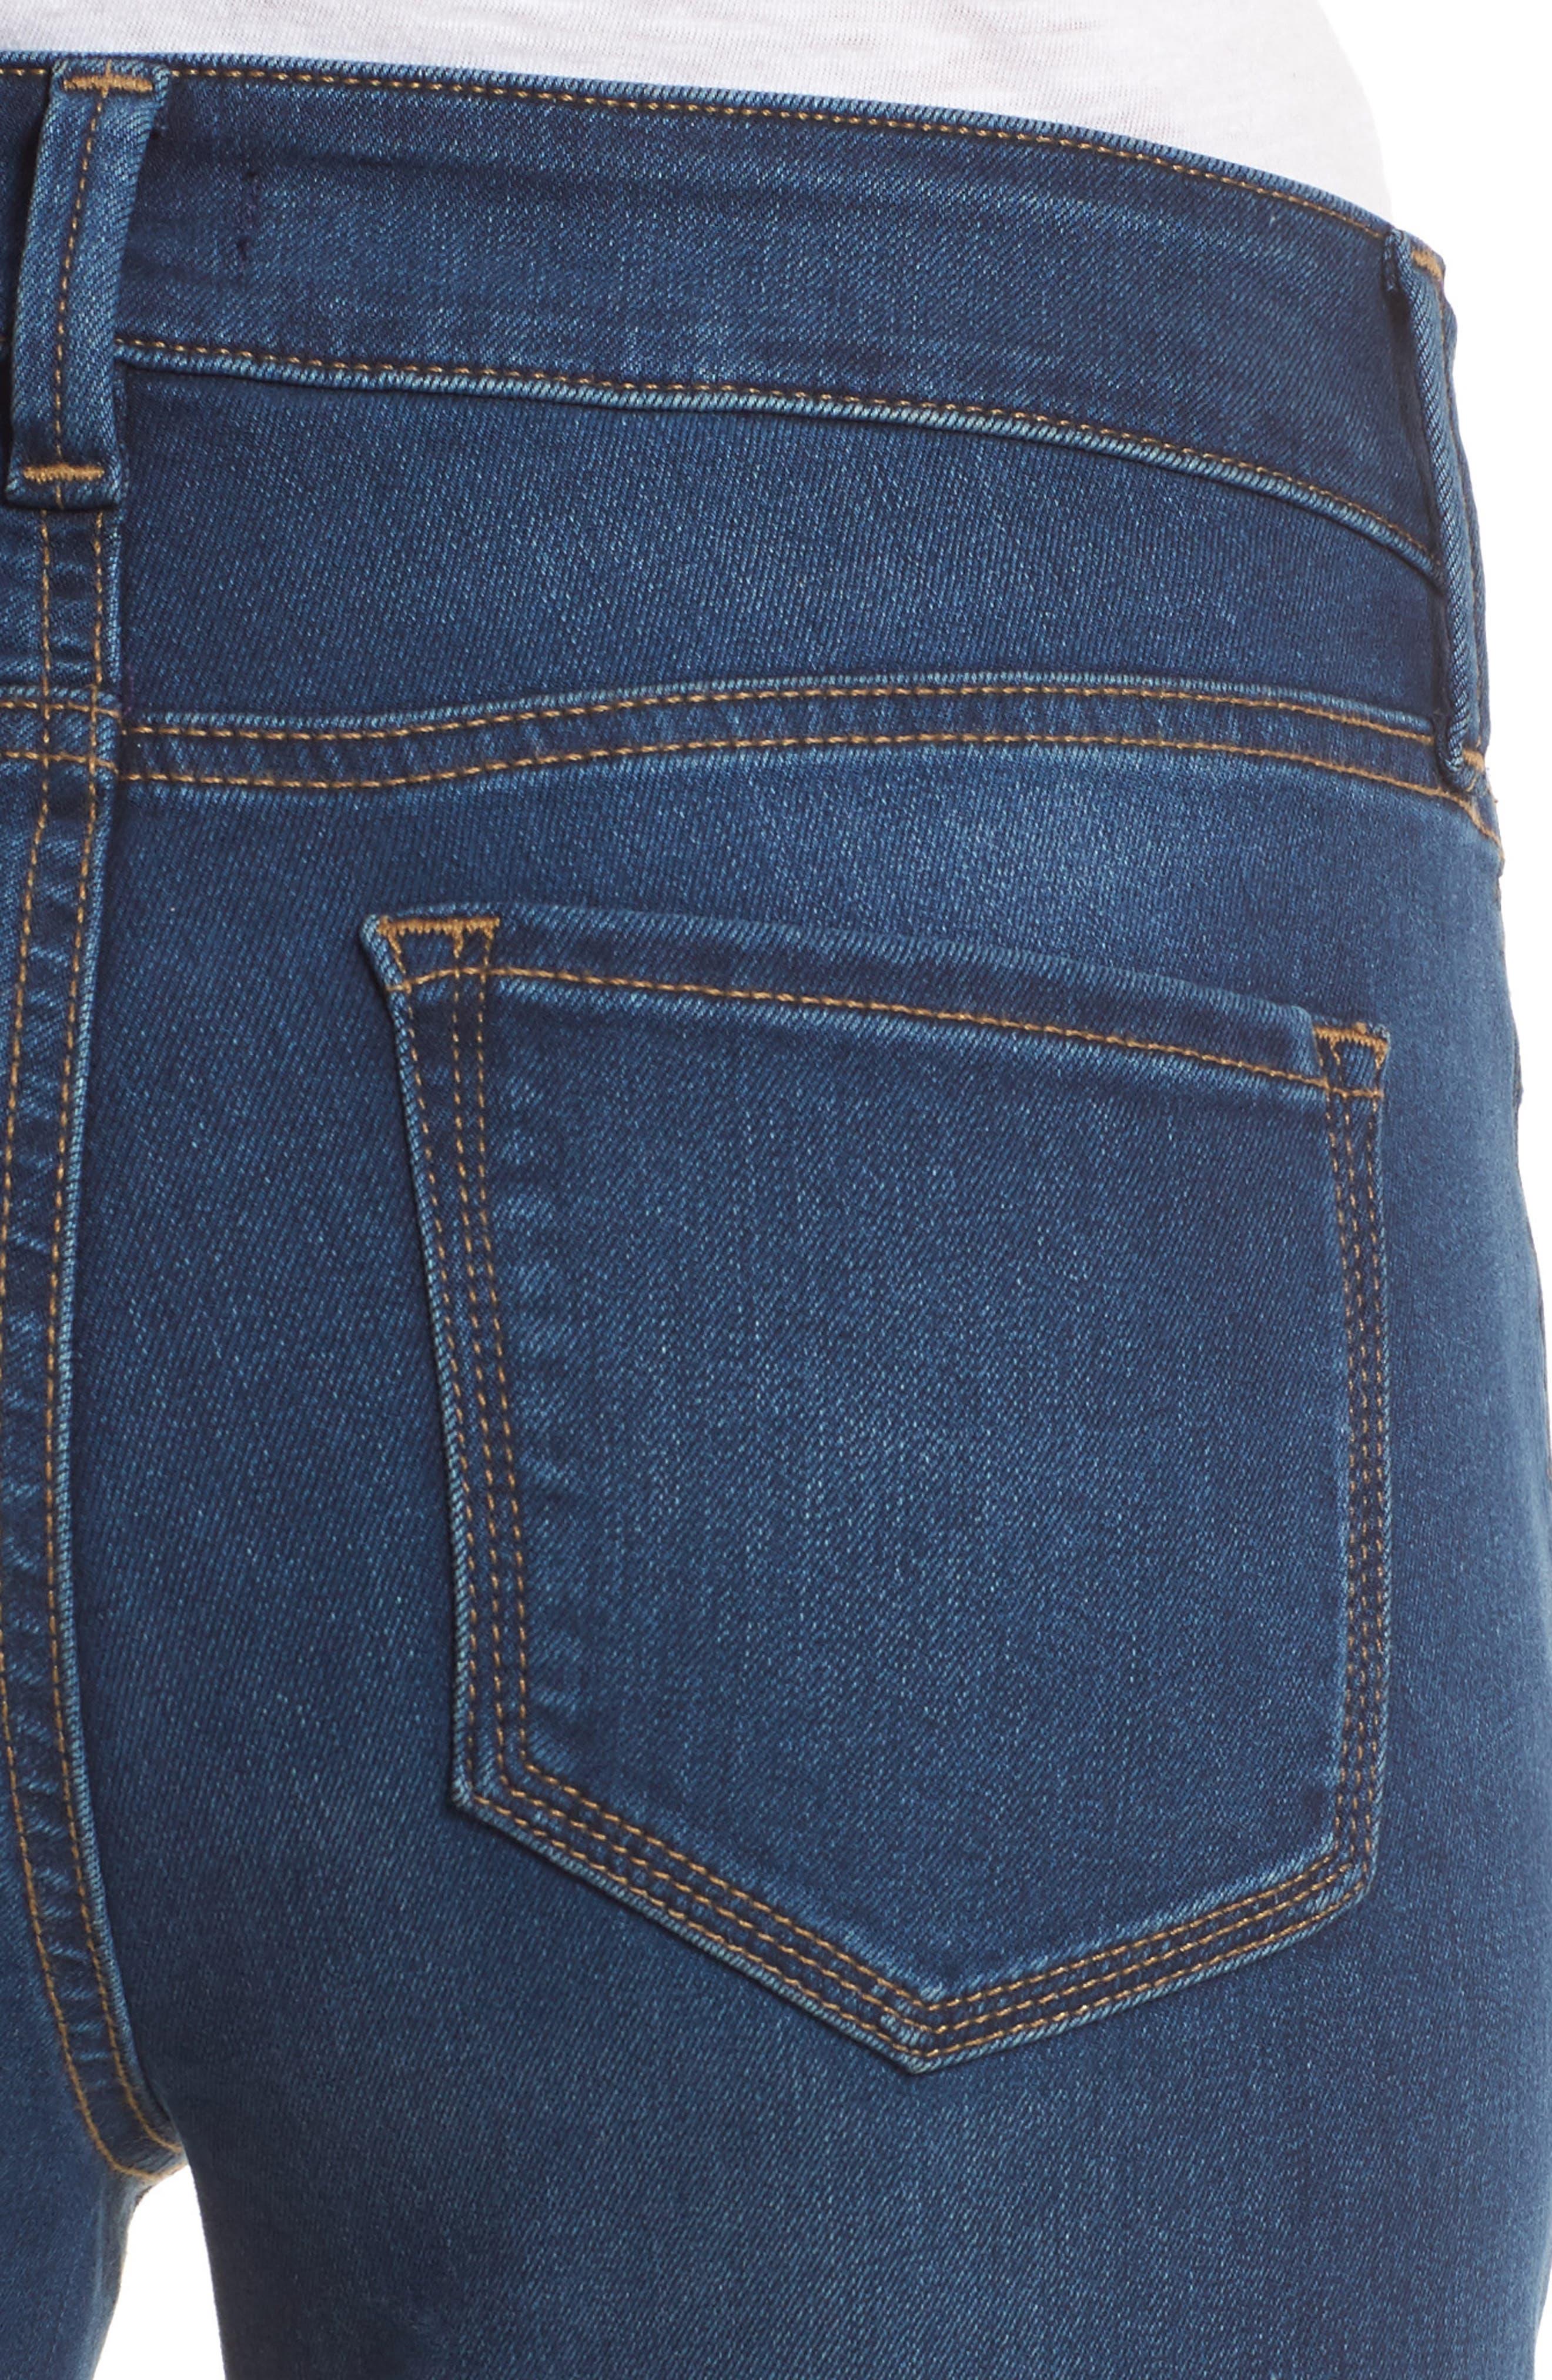 Marilyn Stretch Straight Leg Jeans,                             Alternate thumbnail 4, color,                             SEA BREEZE